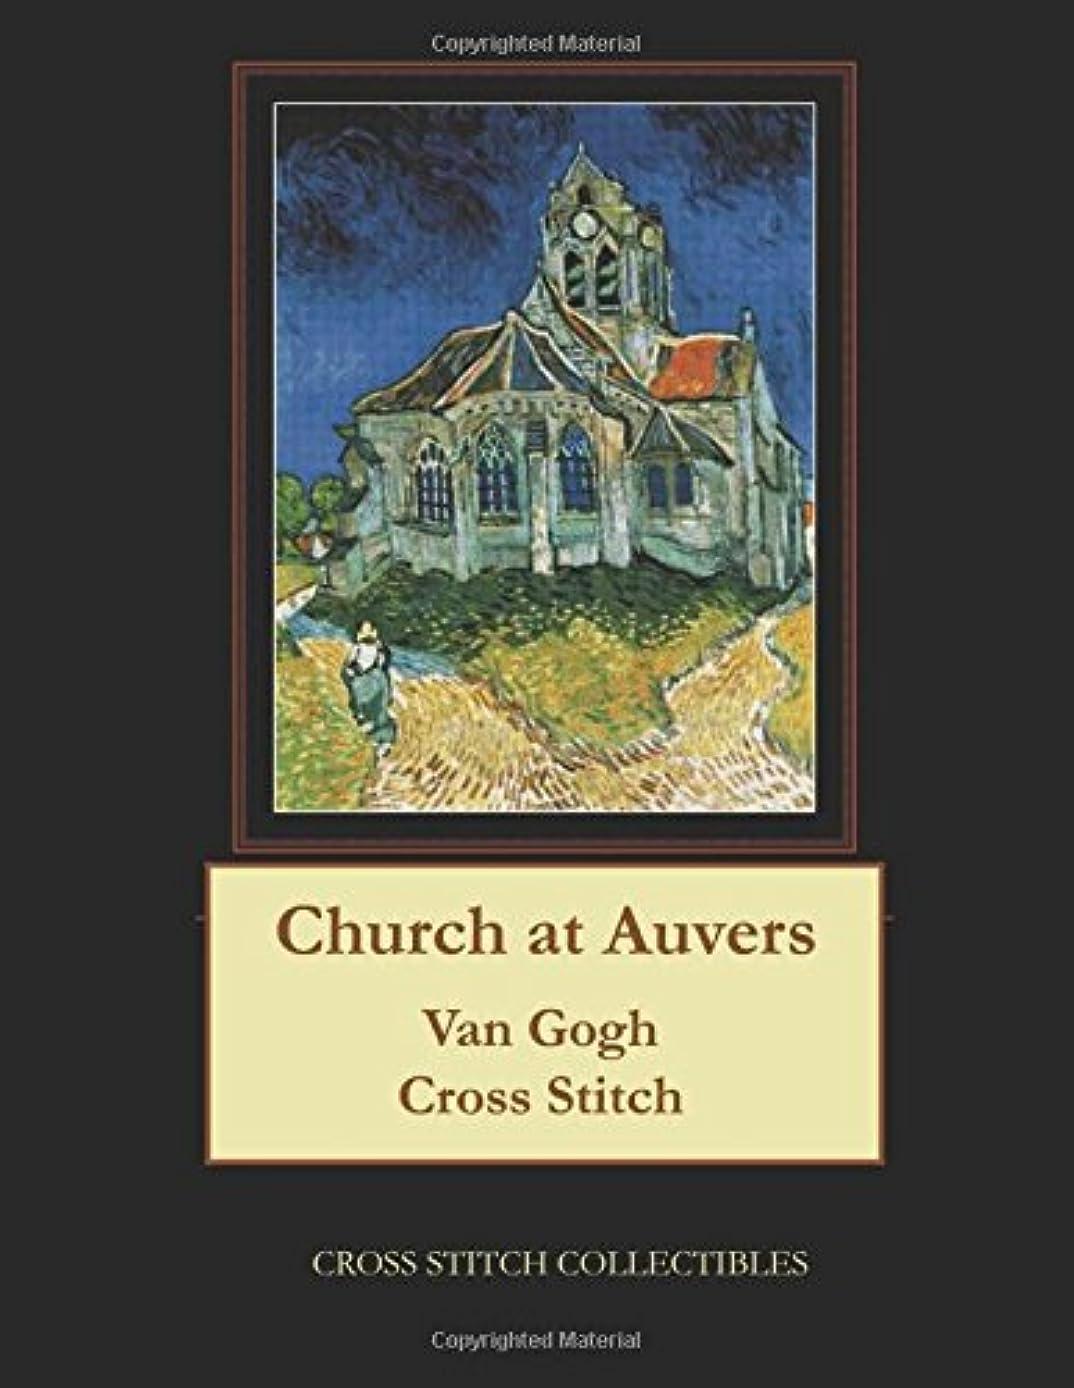 Church at Auvers: Van Gogh Cross Stitch Pattern